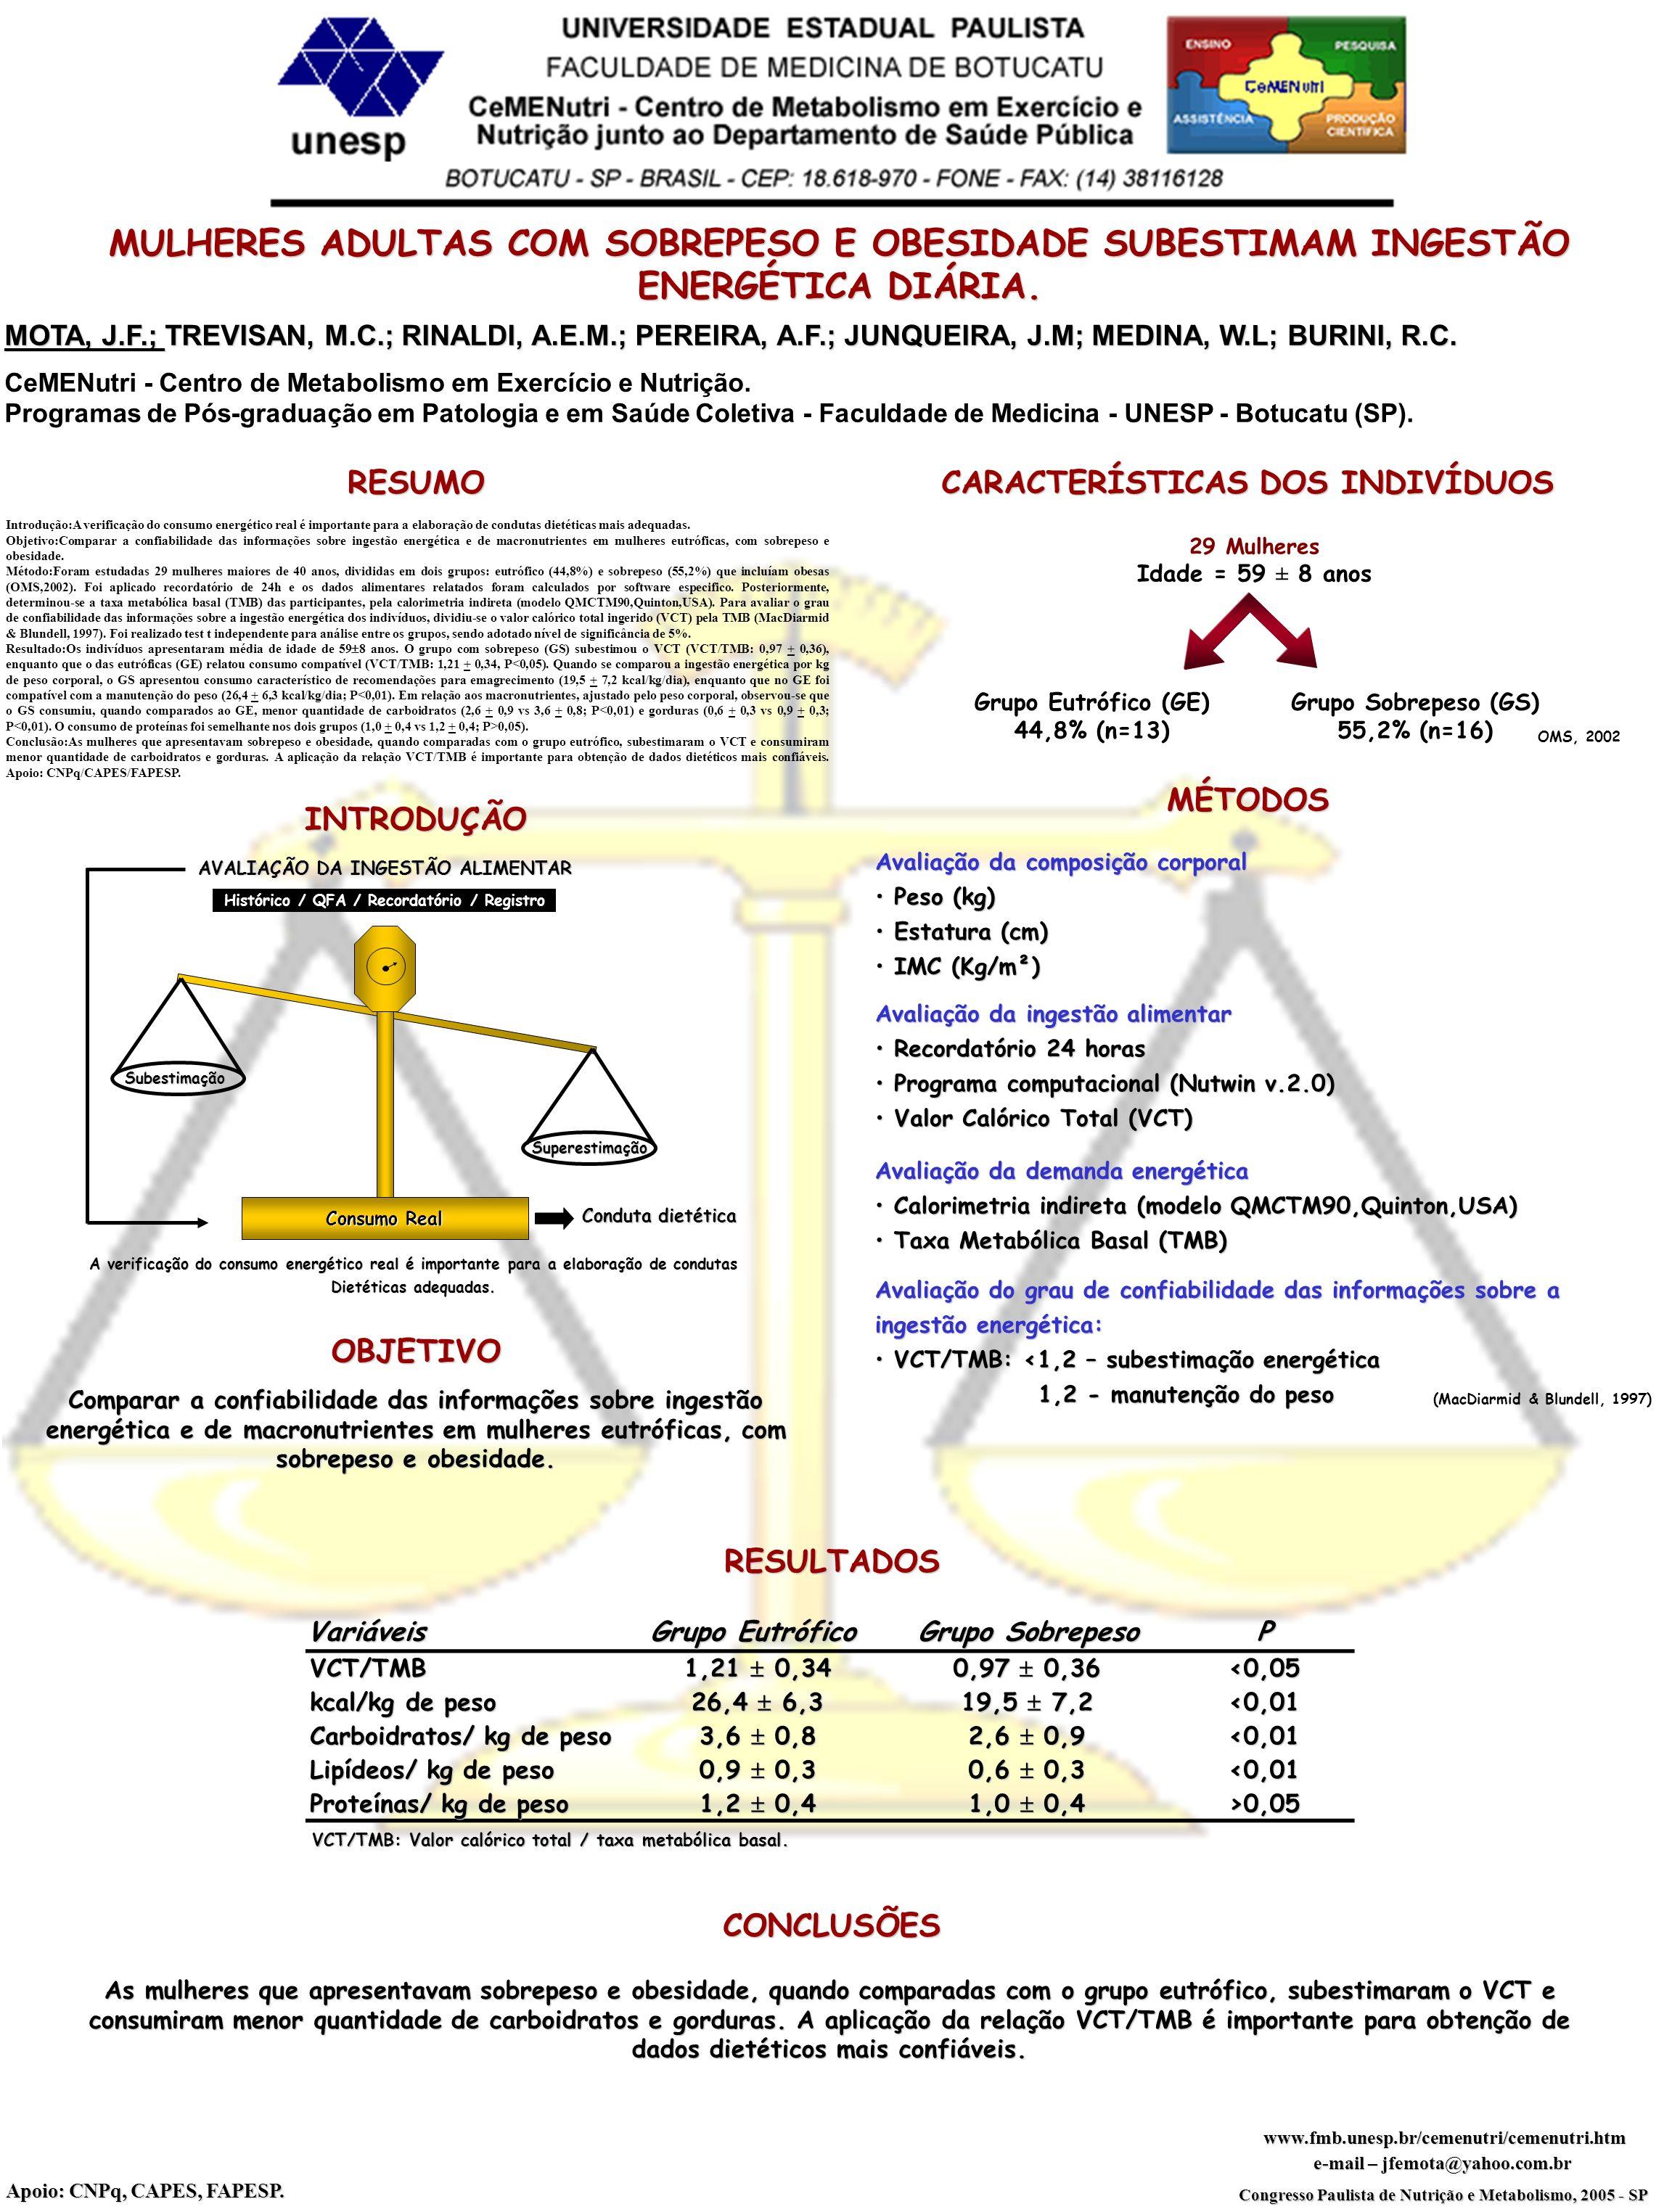 CARACTERÍSTICAS DOS INDIVÍDUOS Grupo Eutrófico (GE) 44,8% (n=13)